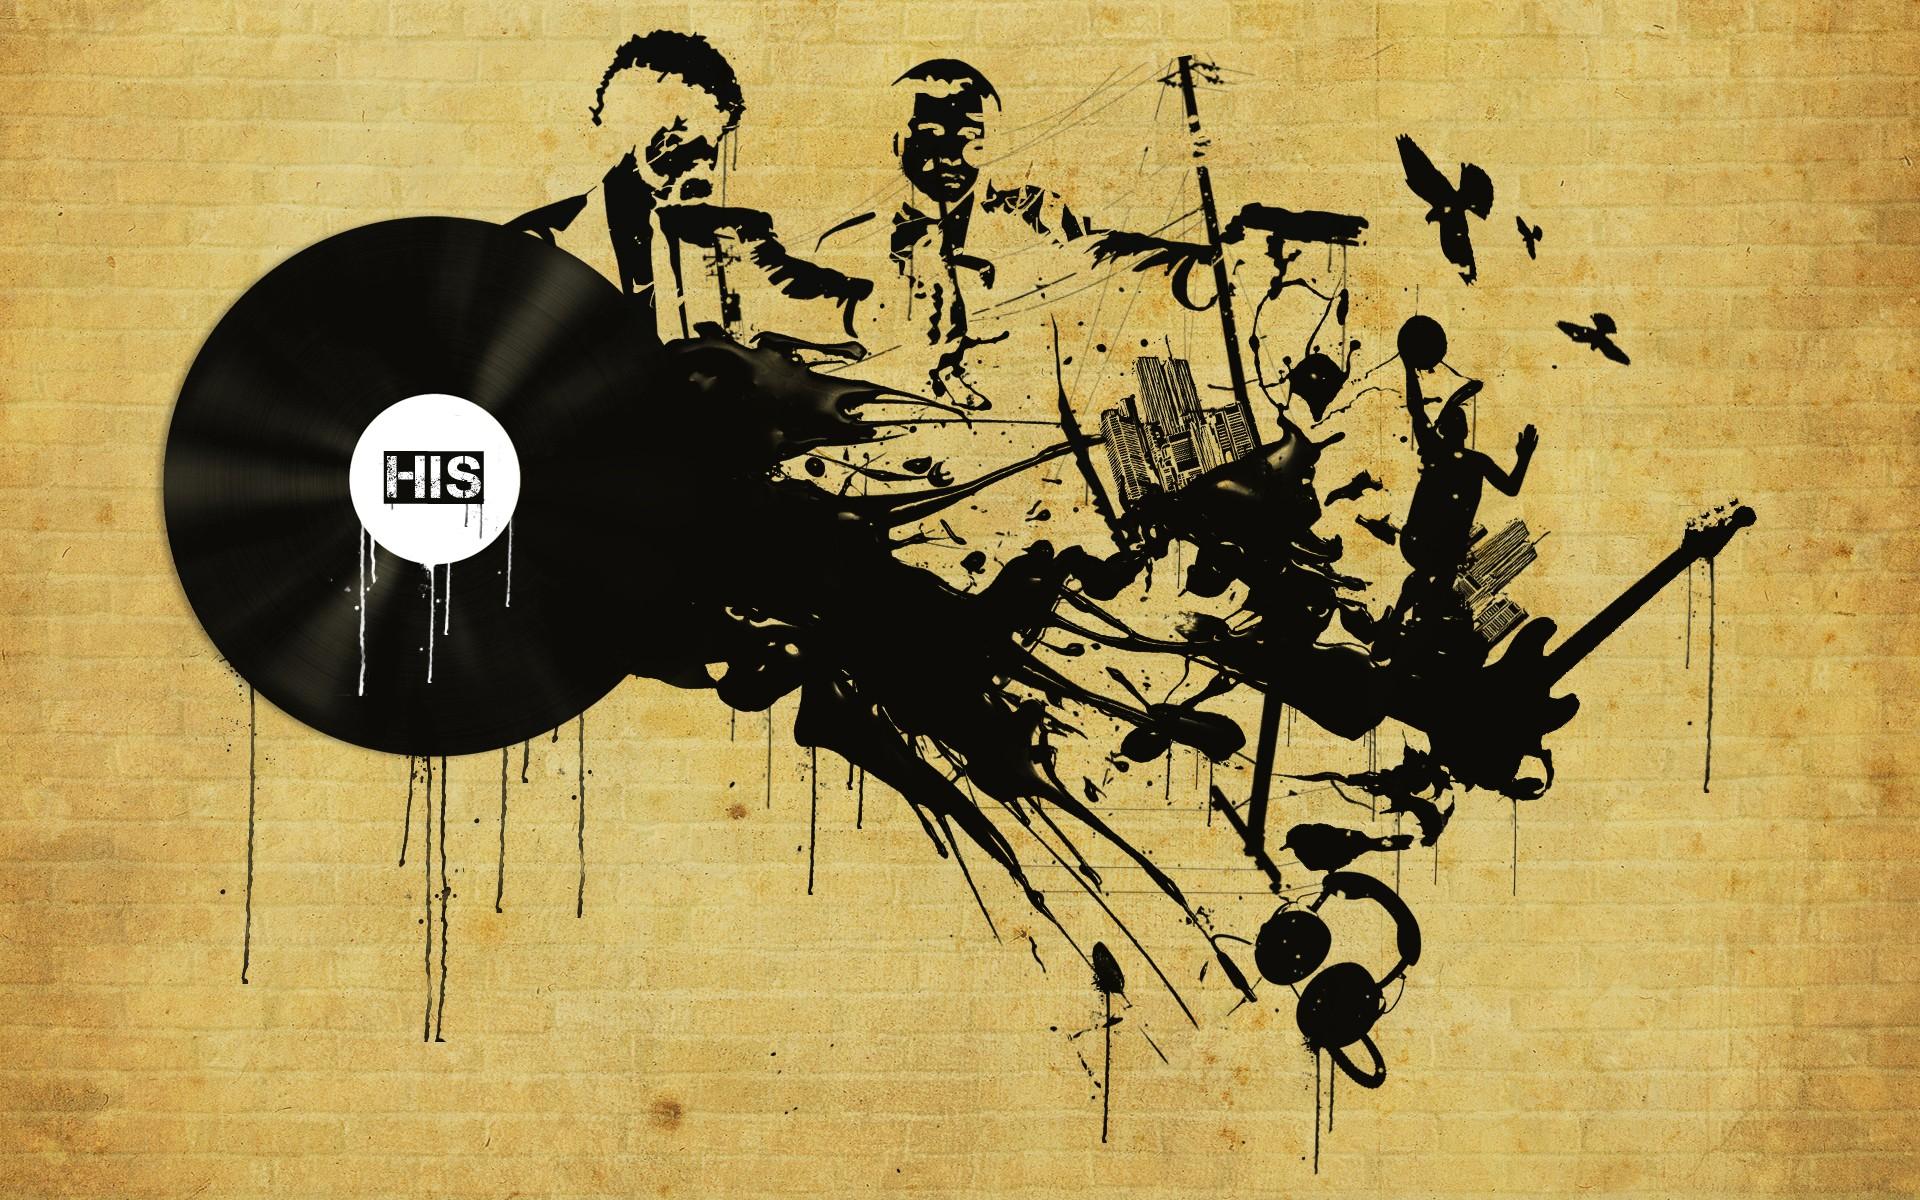 Graffiti art wallpaper - Wallpaper Graffiti Music Wallpapers Hd Wallpaper Background Desktop